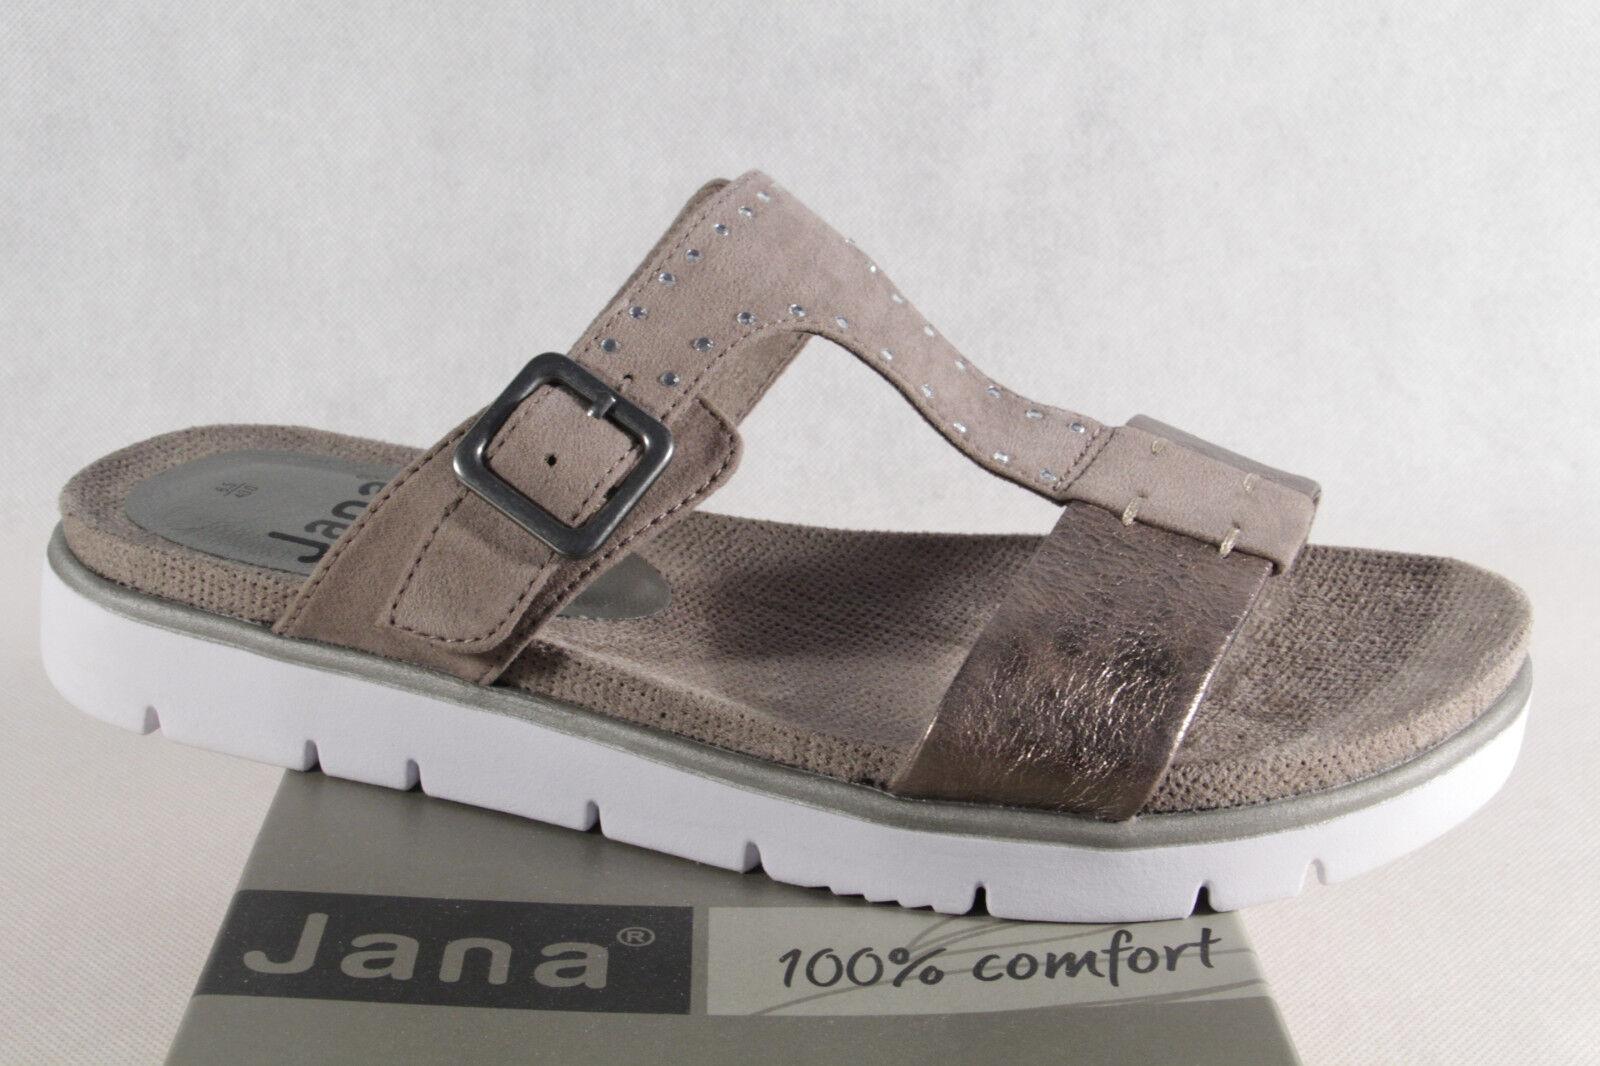 Último gran descuento JANA Sandalias De Mujer Sandalias Gris / gris topo 27100 NUEVO